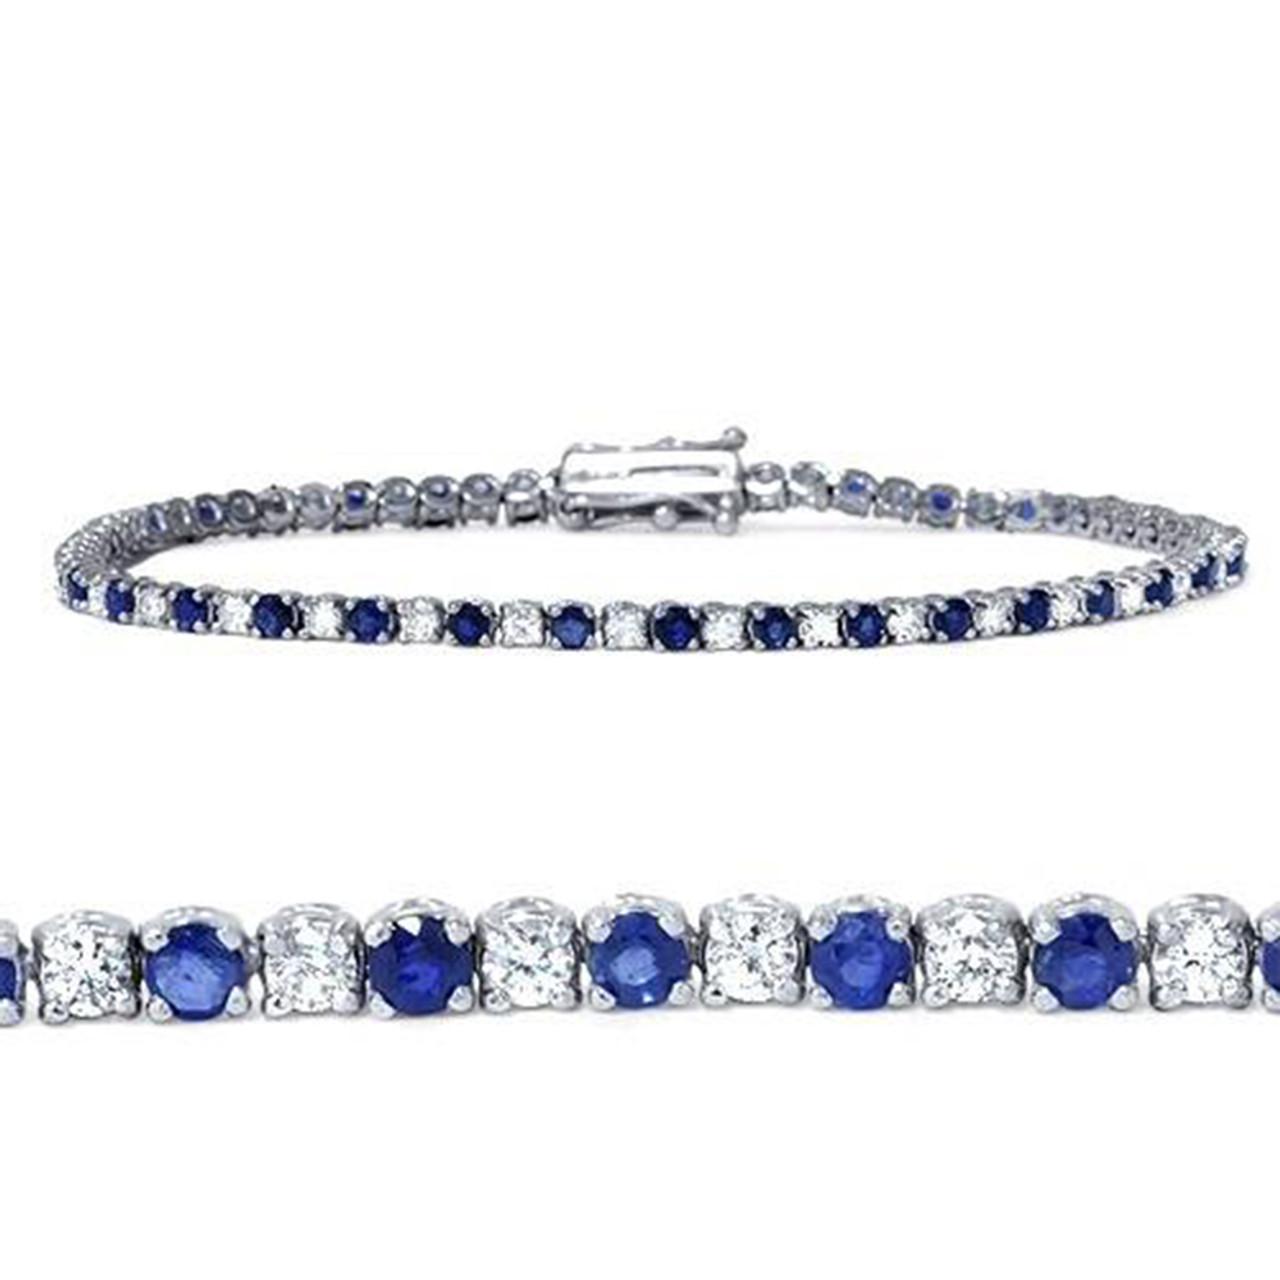 SAPPHIRE /& DIAMONDS TENNIS BRACELET